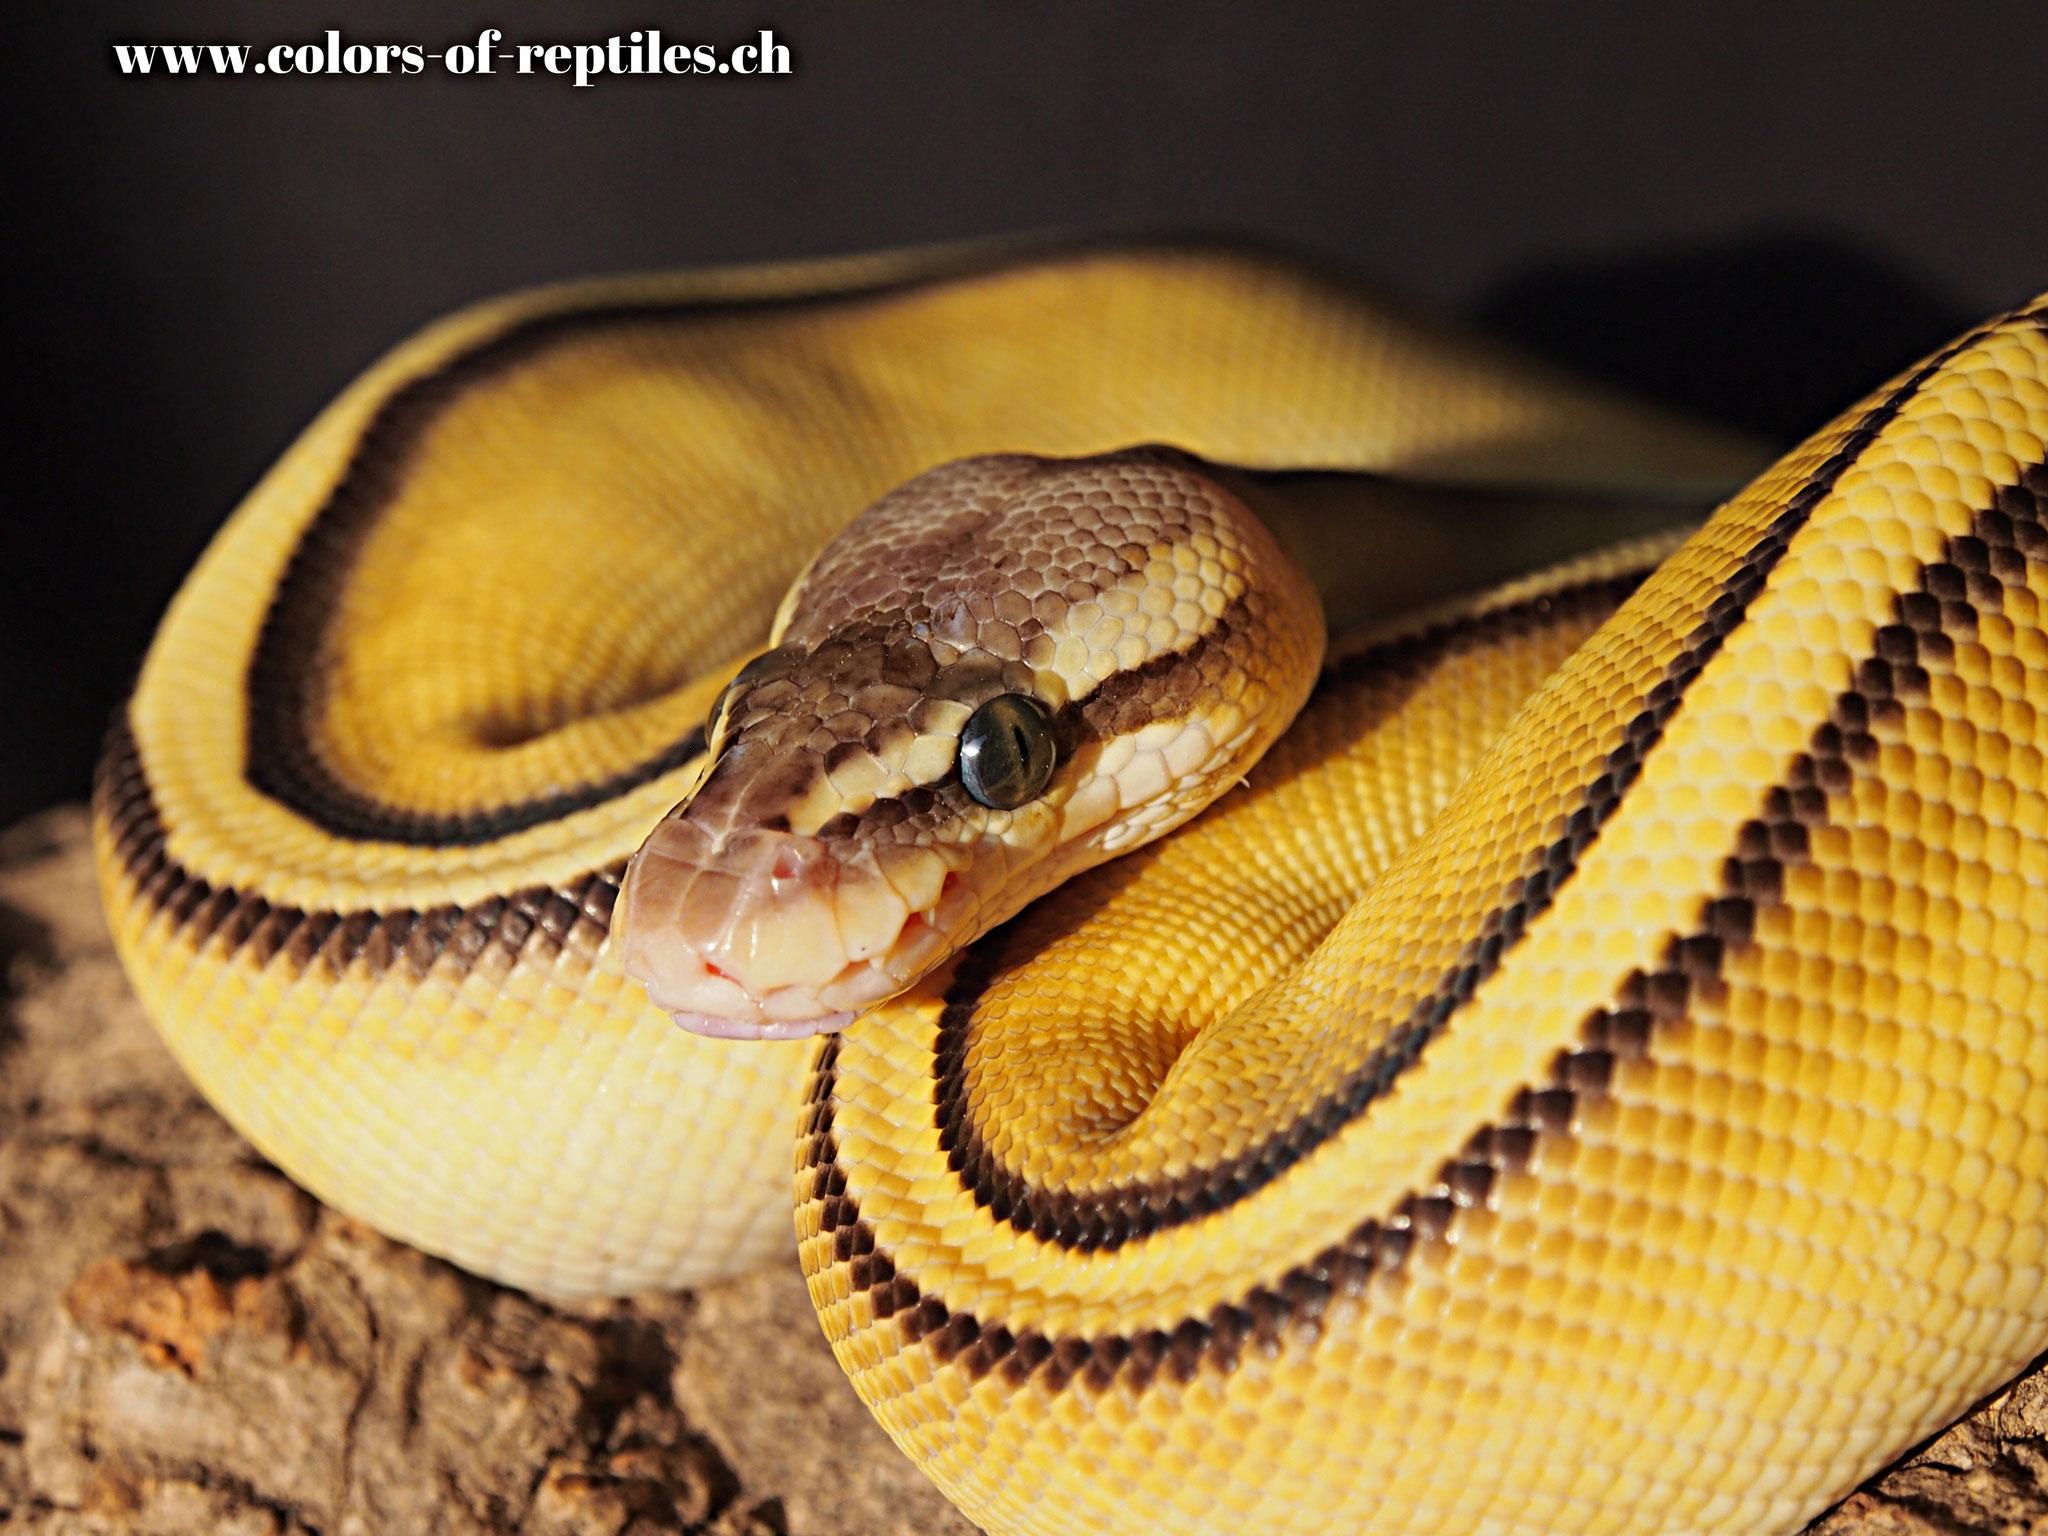 Königspython - Python regius (Pastel / G-stripe)